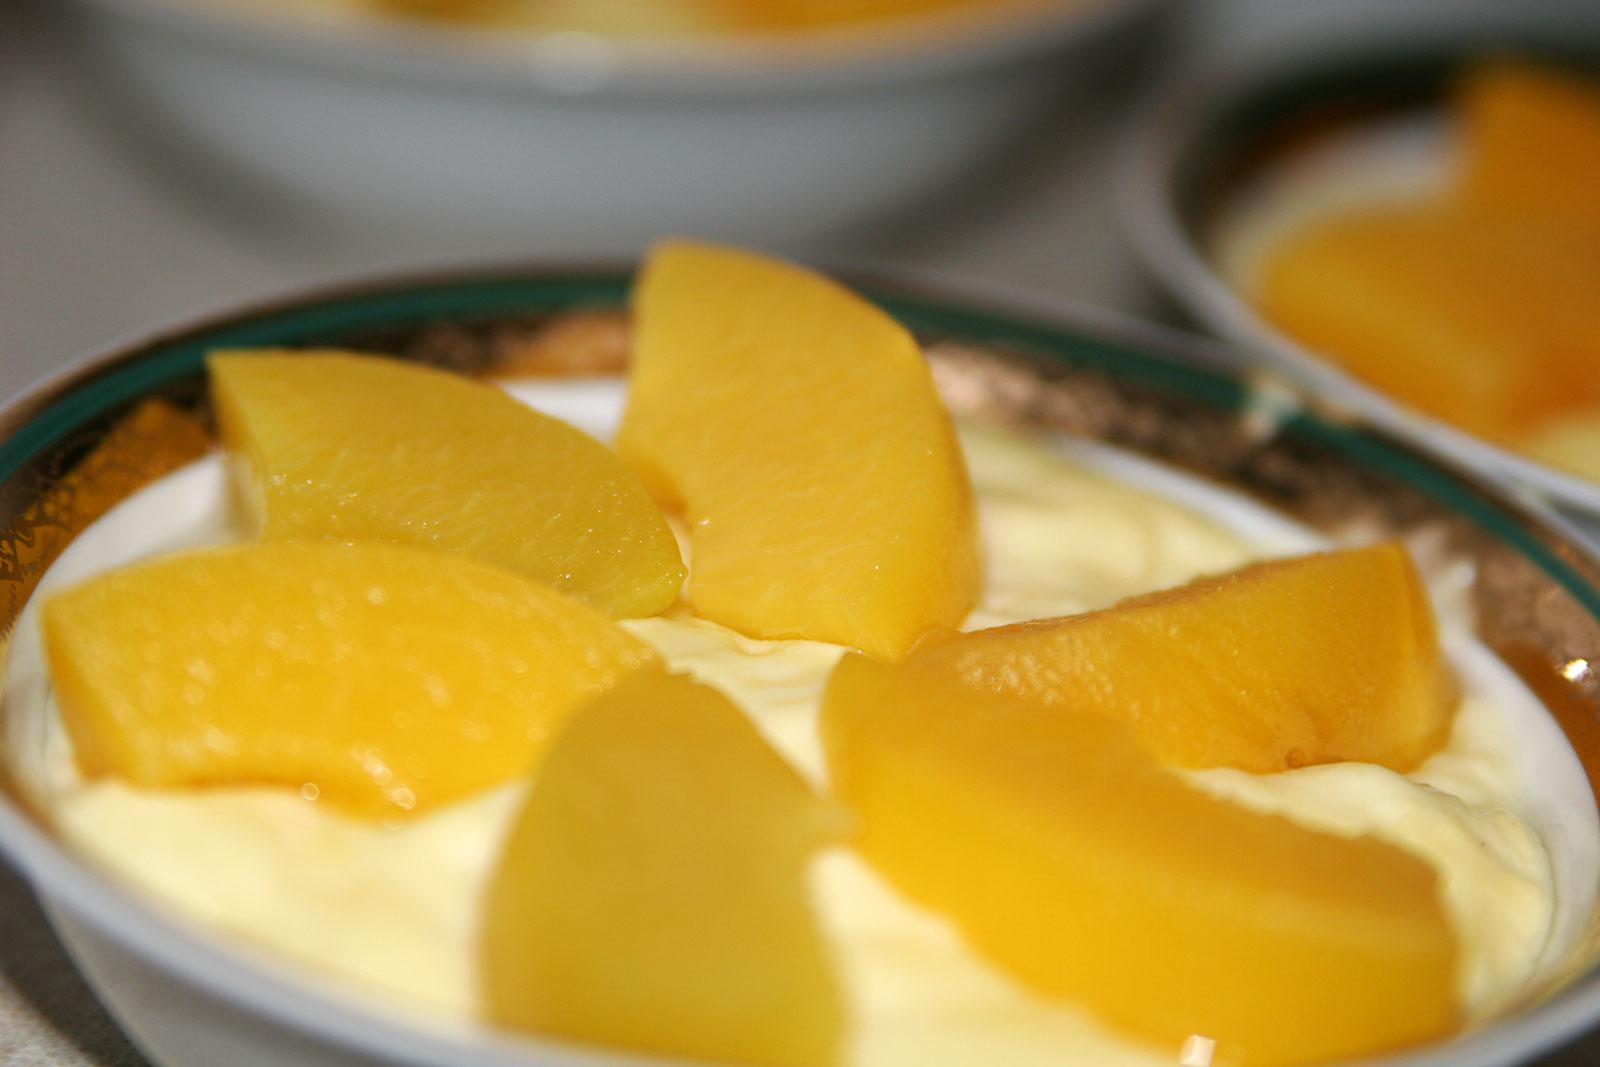 FilePeach Dessertjpg Wikimedia Commons